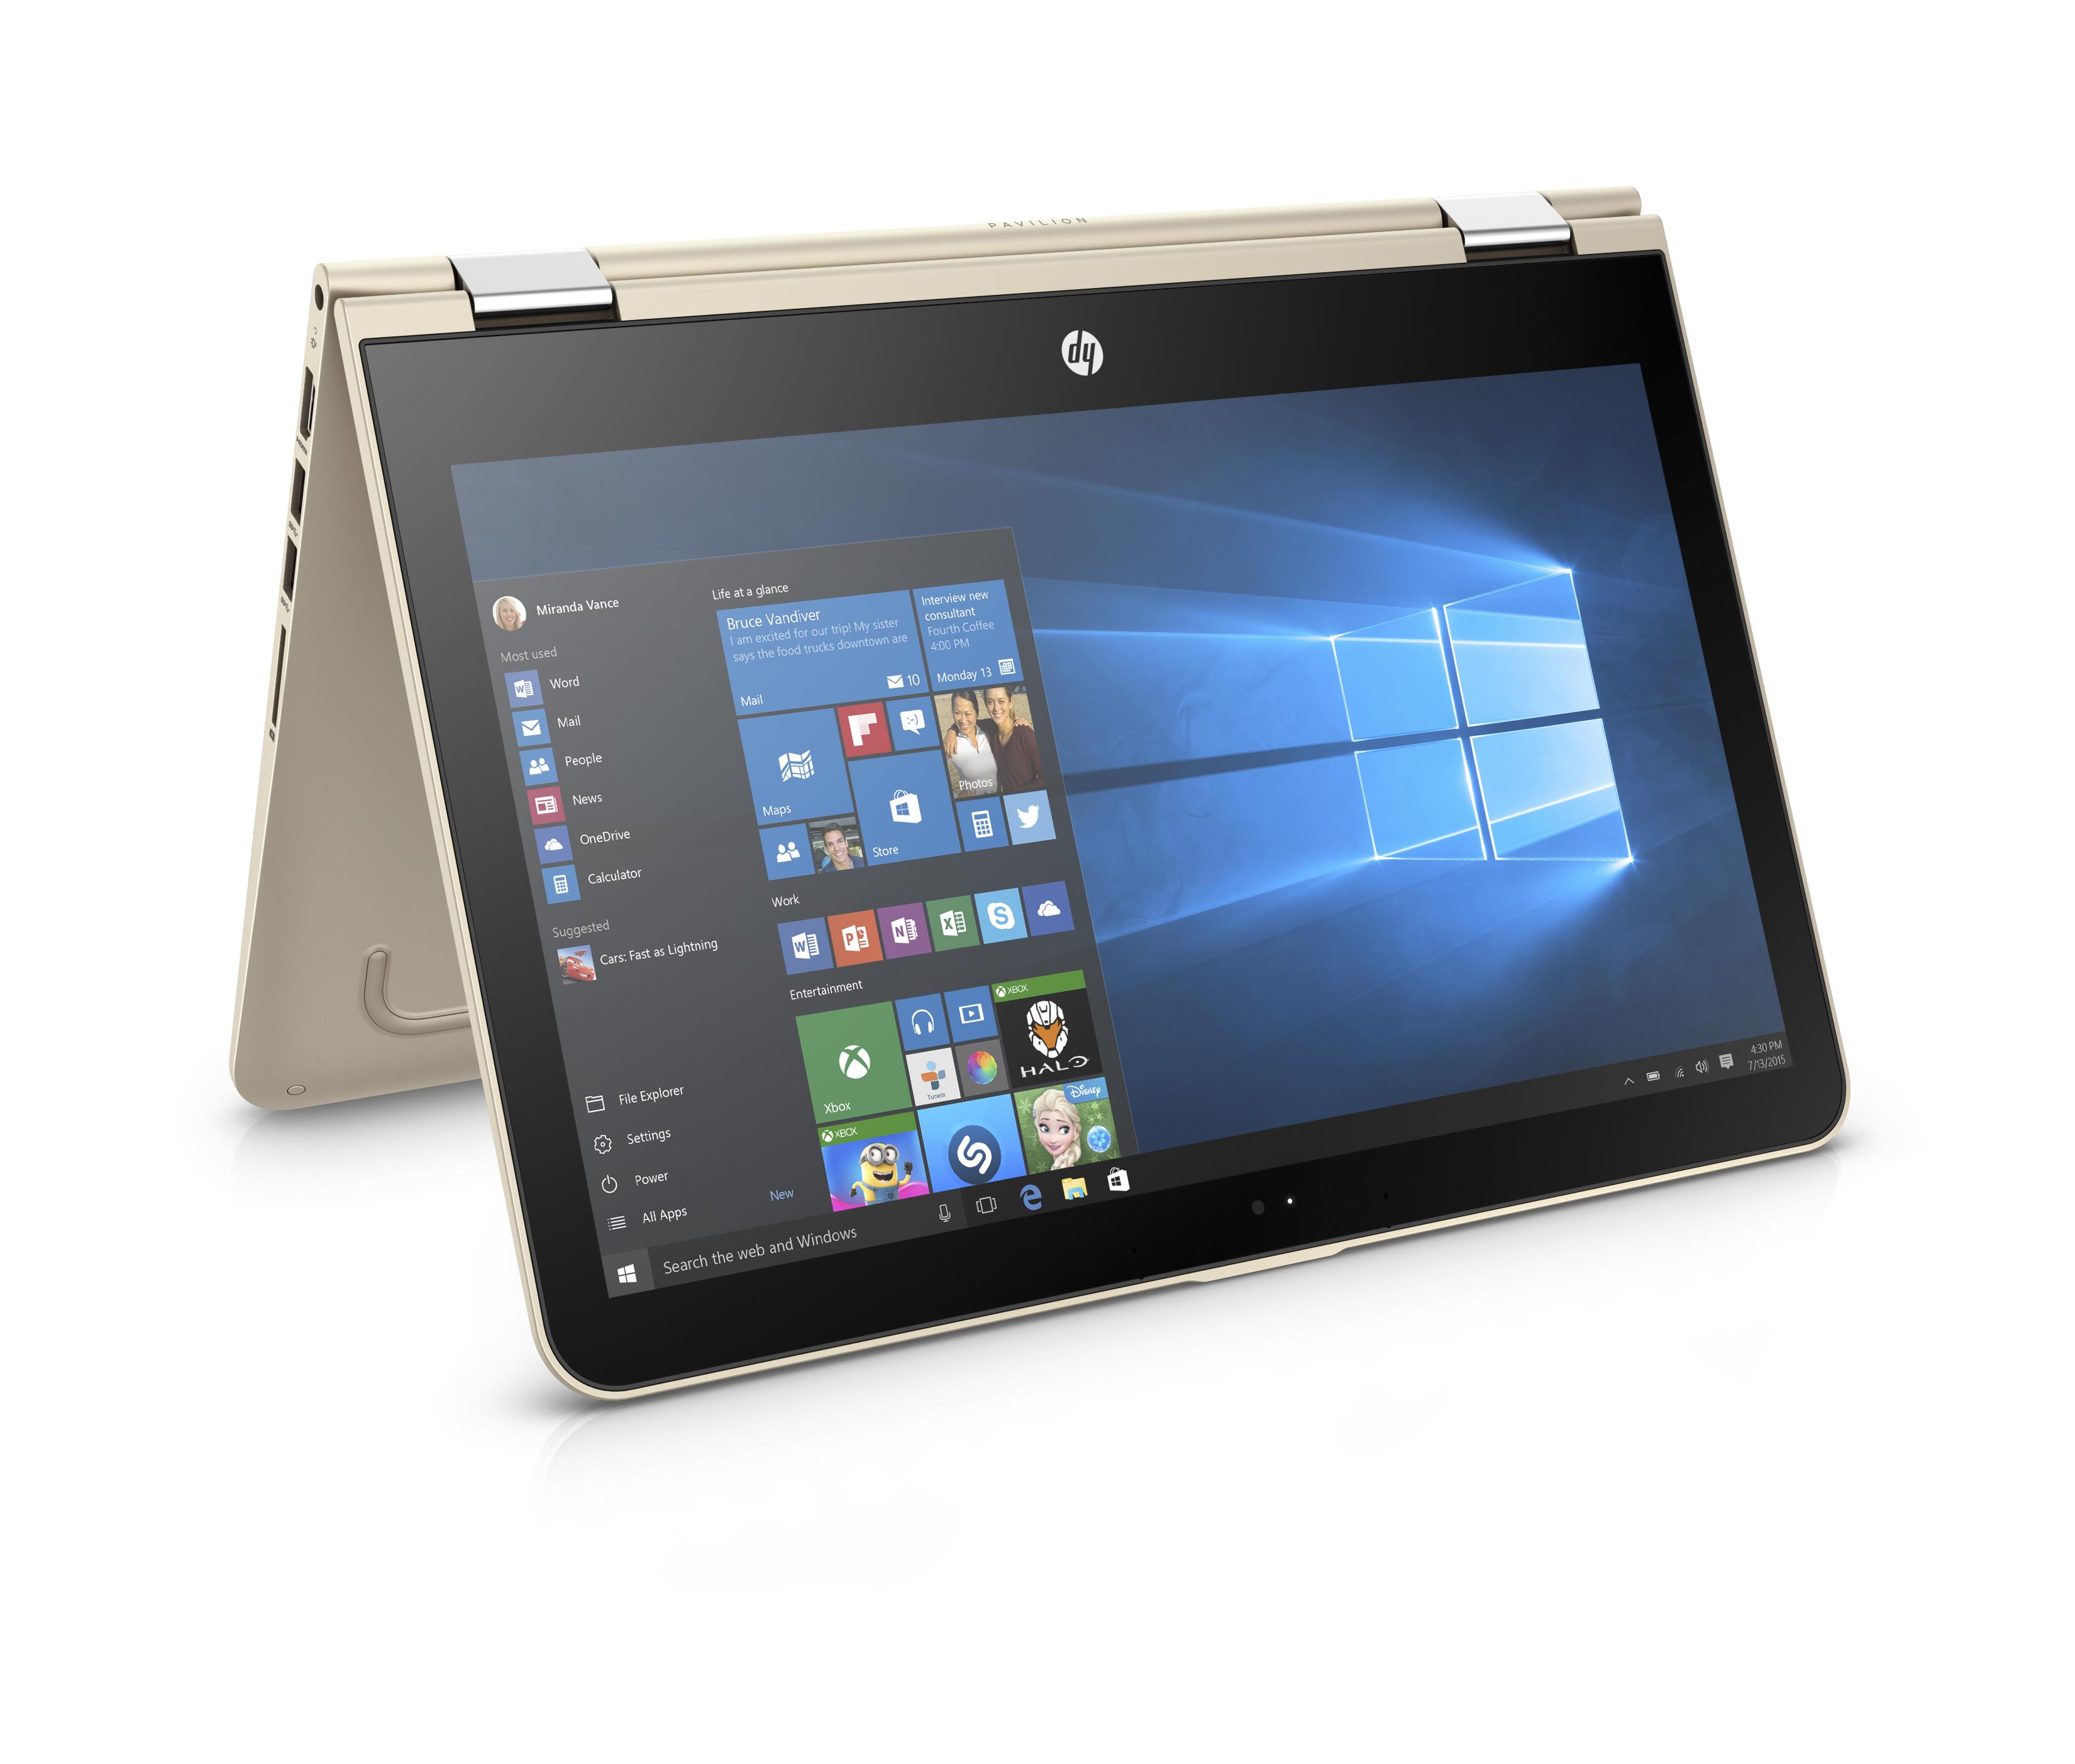 HP Pavilion x360 13-u002nc FHD i3-6100U/4GB/500GB+8GB/2RServis/W10-gold